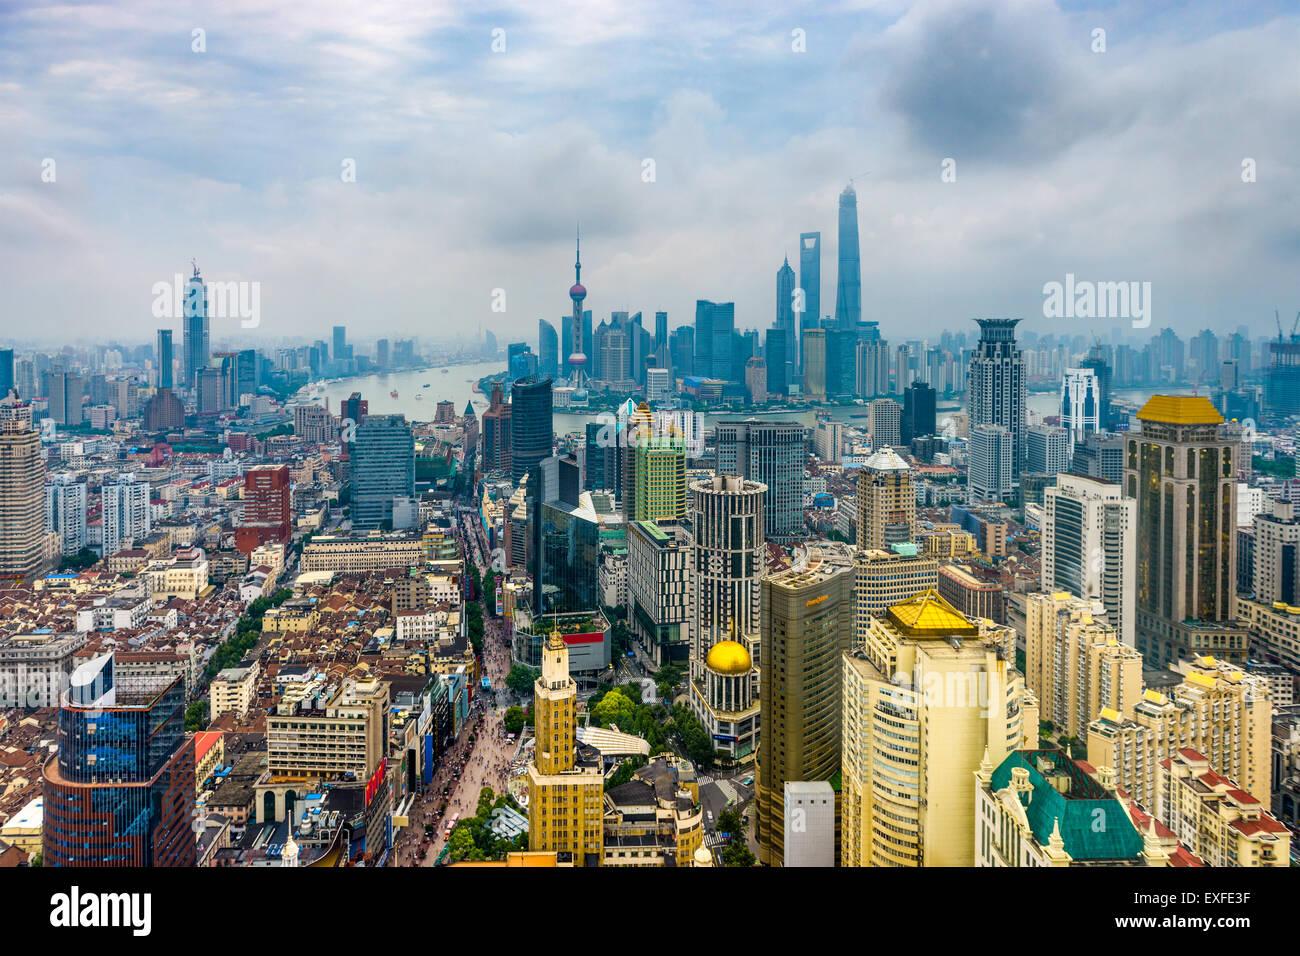 Aerial Skyline von Shanghai, China. Stockbild